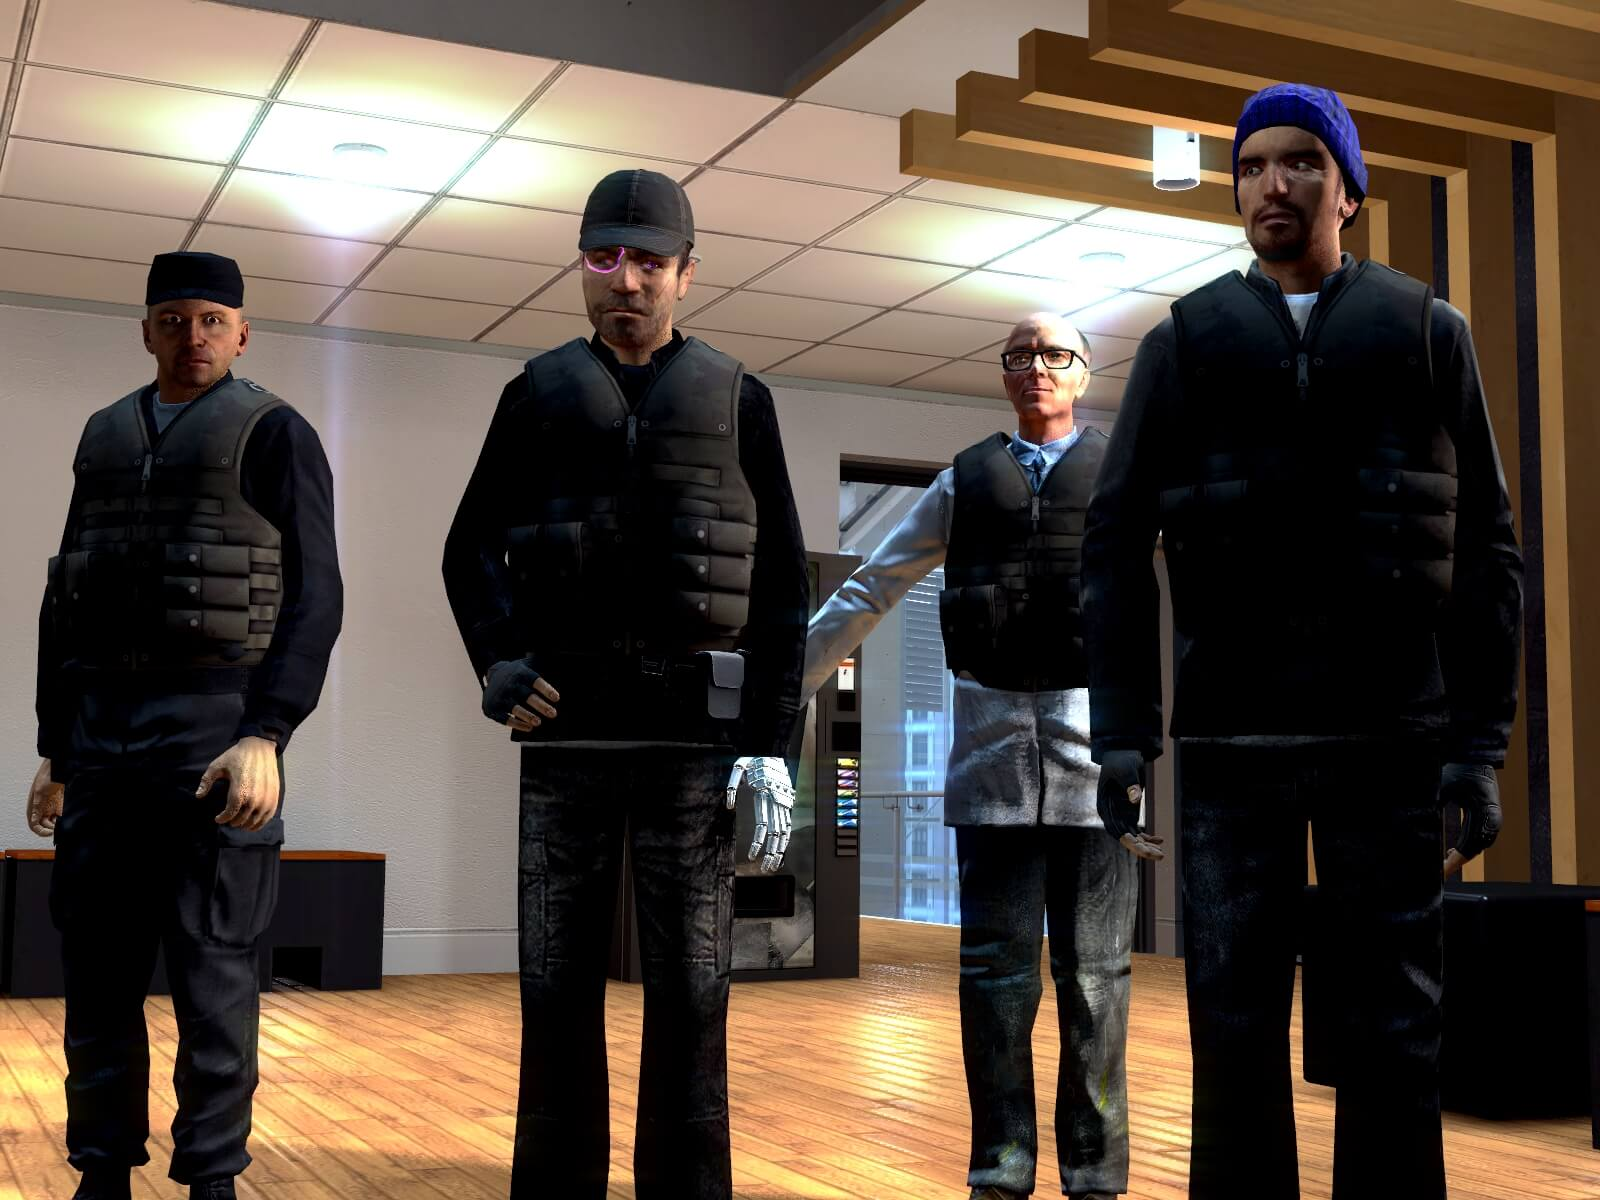 Garry's Mod - Кевларовая броня из Counter-Strike: Global Offensive